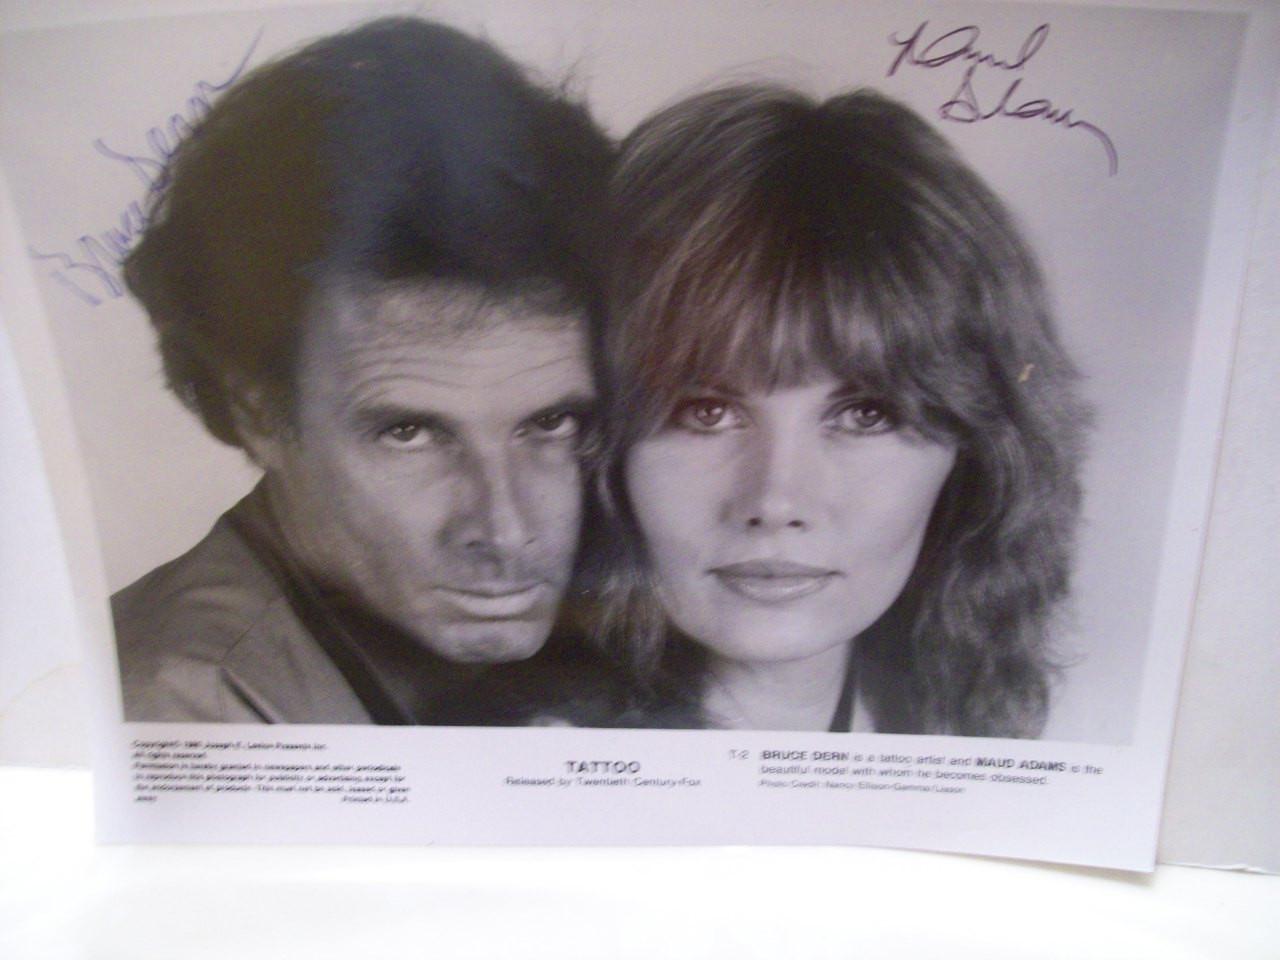 Adams, Maud Bruce Dern Photo Signed Autograph Tattoo 1981